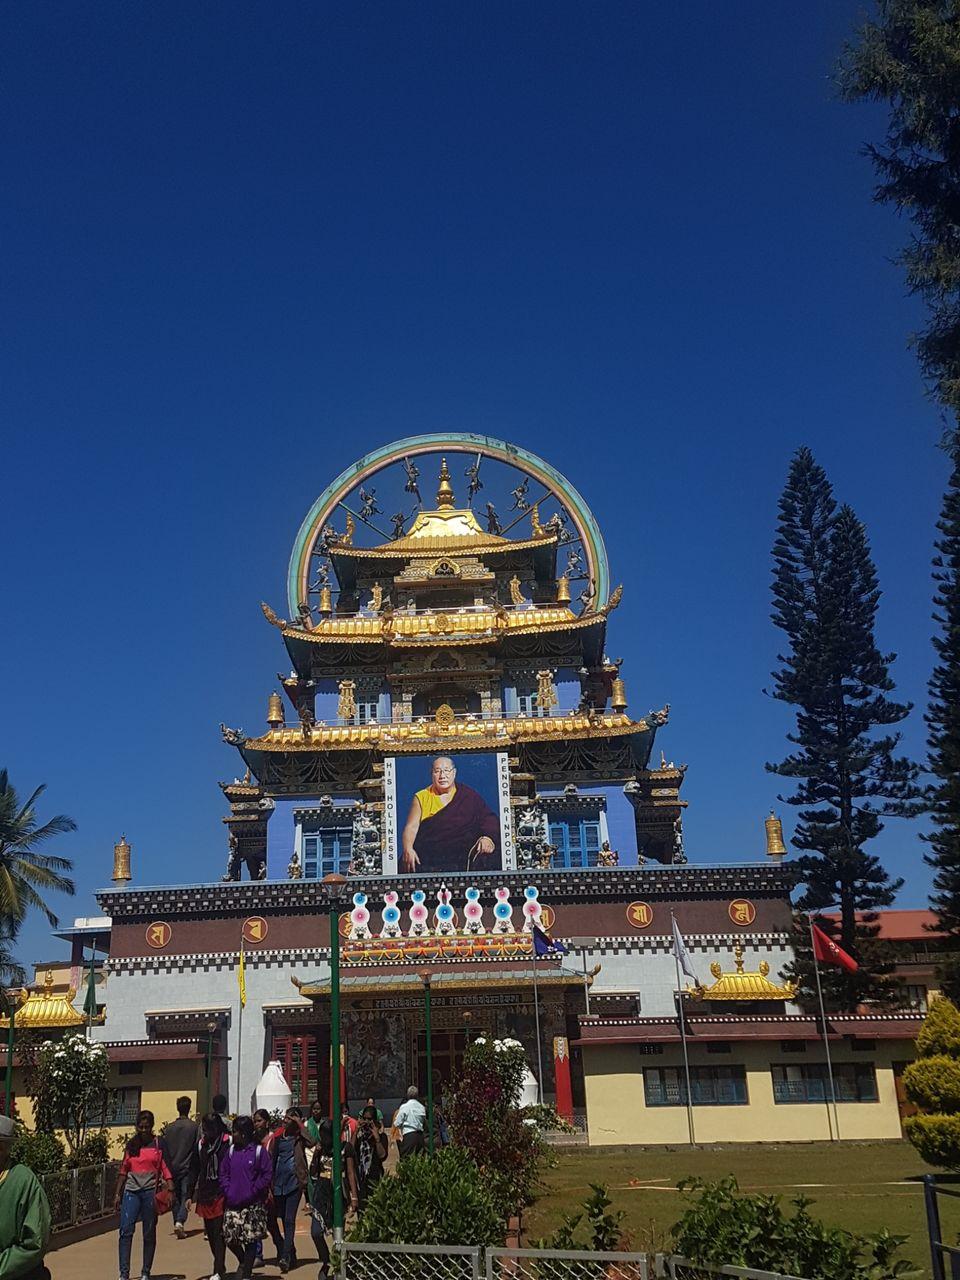 Photo of Namdroling Monastery, Bylakuppe, Karnataka, India by The Fervid Traveller